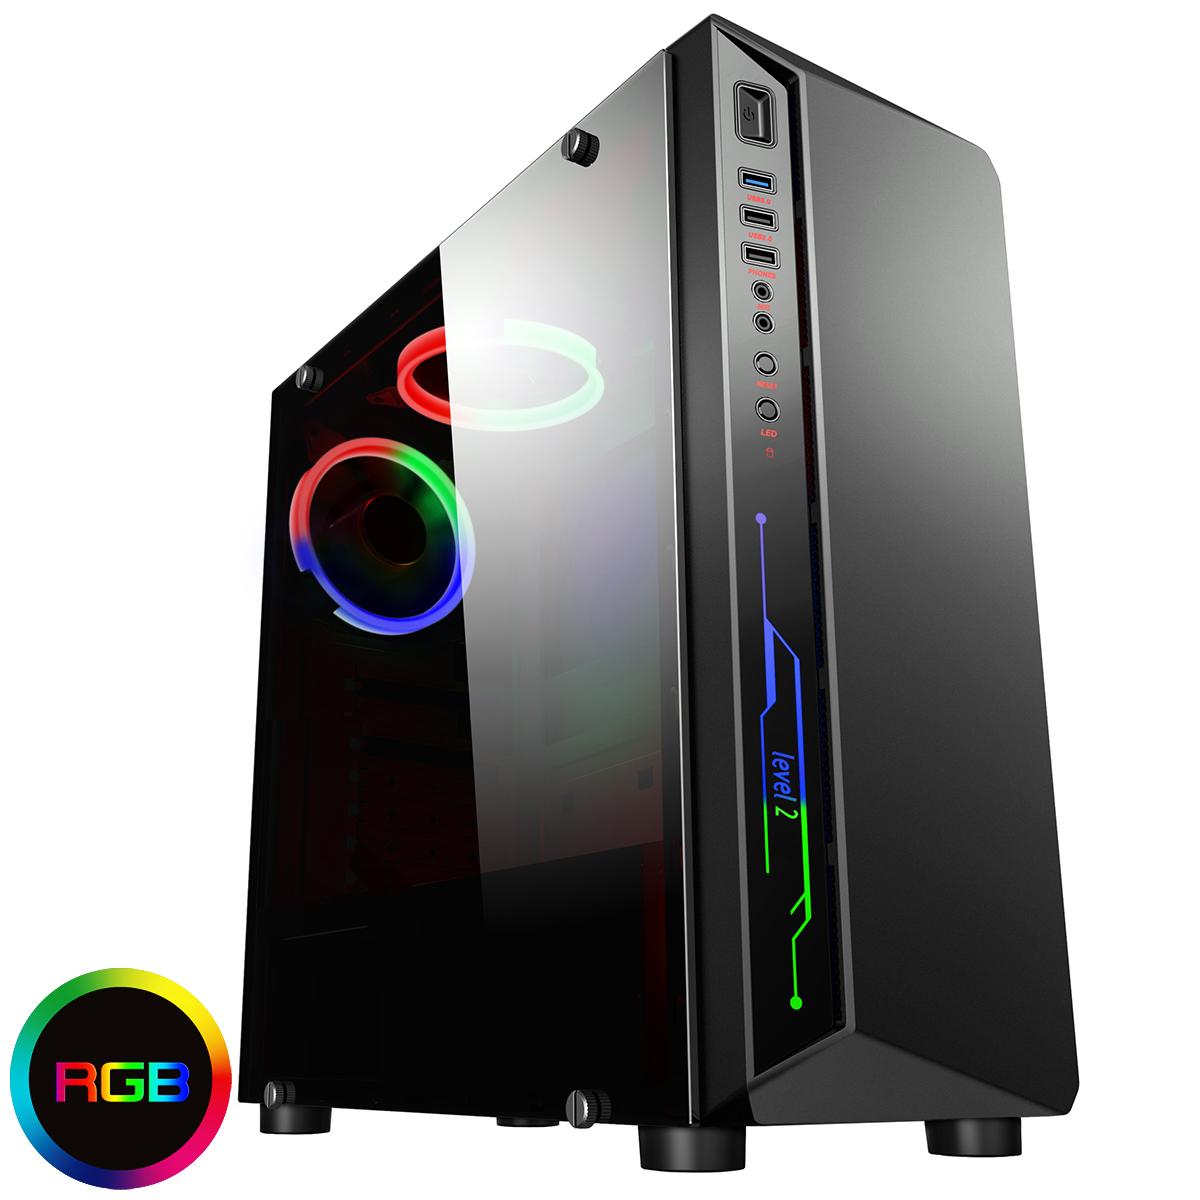 Computer Games - Gaming PC Quad Core i5 Computer SSD HDD 4-16 GB RAM GT GTX GFX Windows 10 WiFi